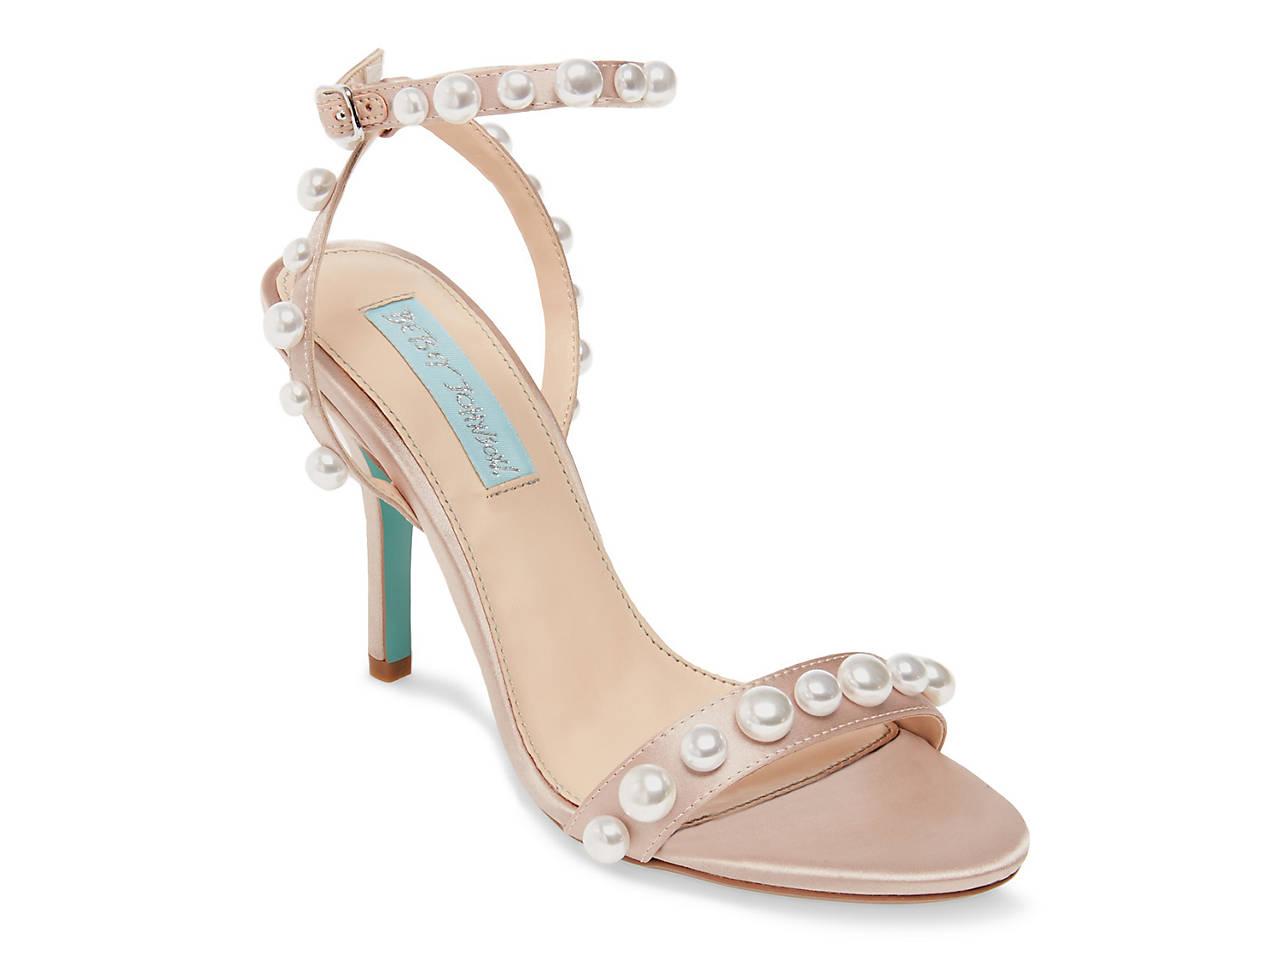 f181d1b02 Betsey Johnson Klara Sandal Women s Shoes